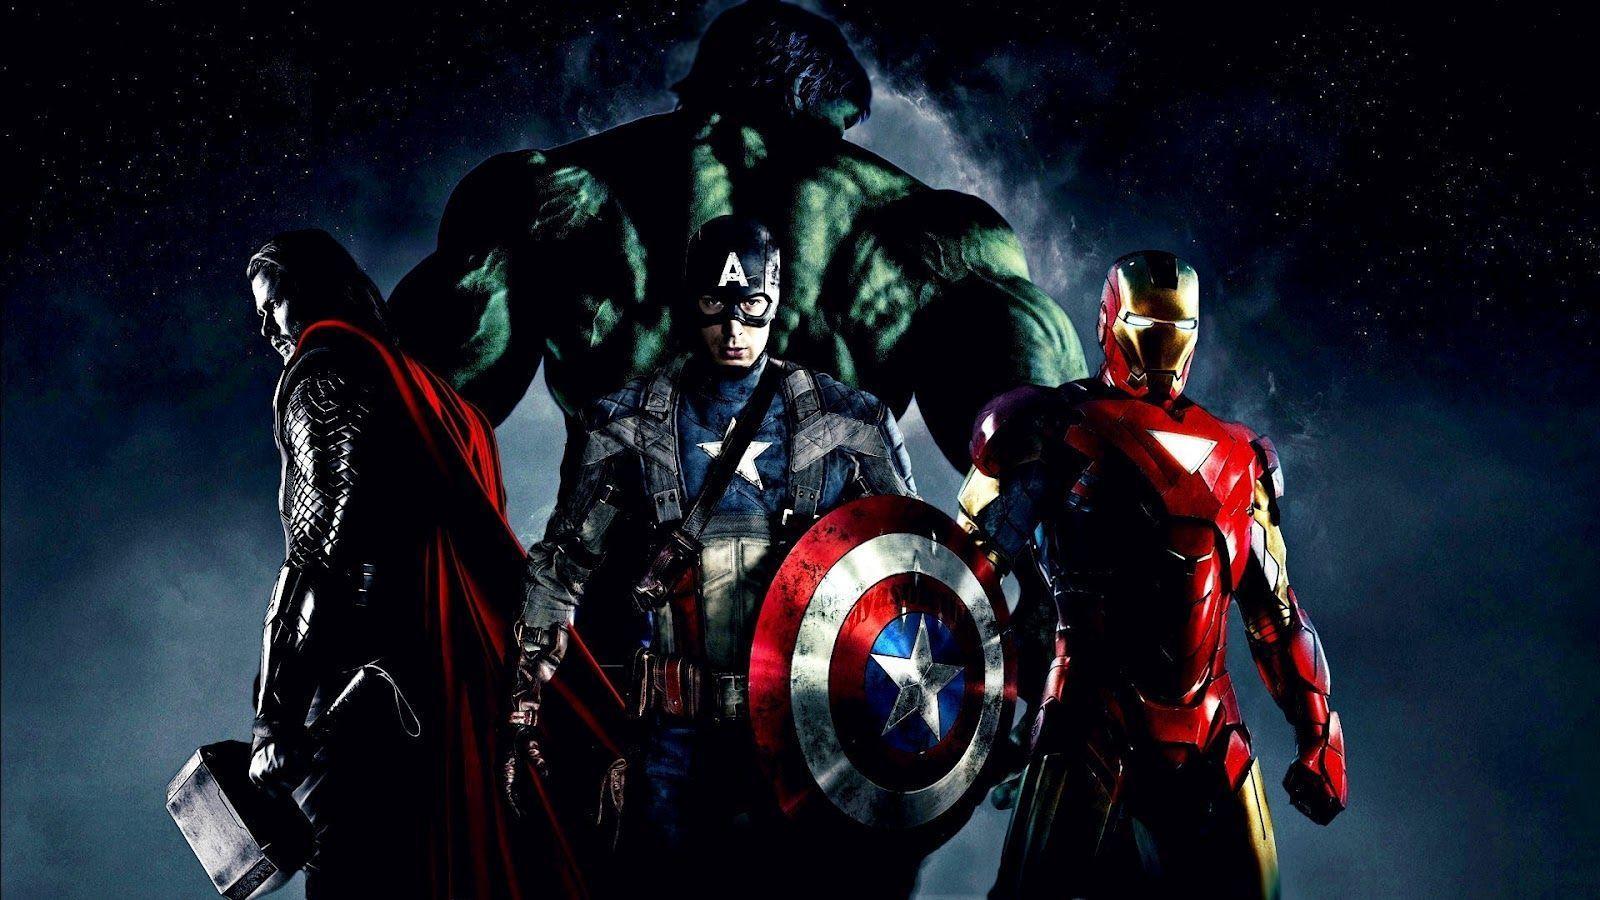 Wallpapers For > Iron Man Avengers Wallpaper Hd